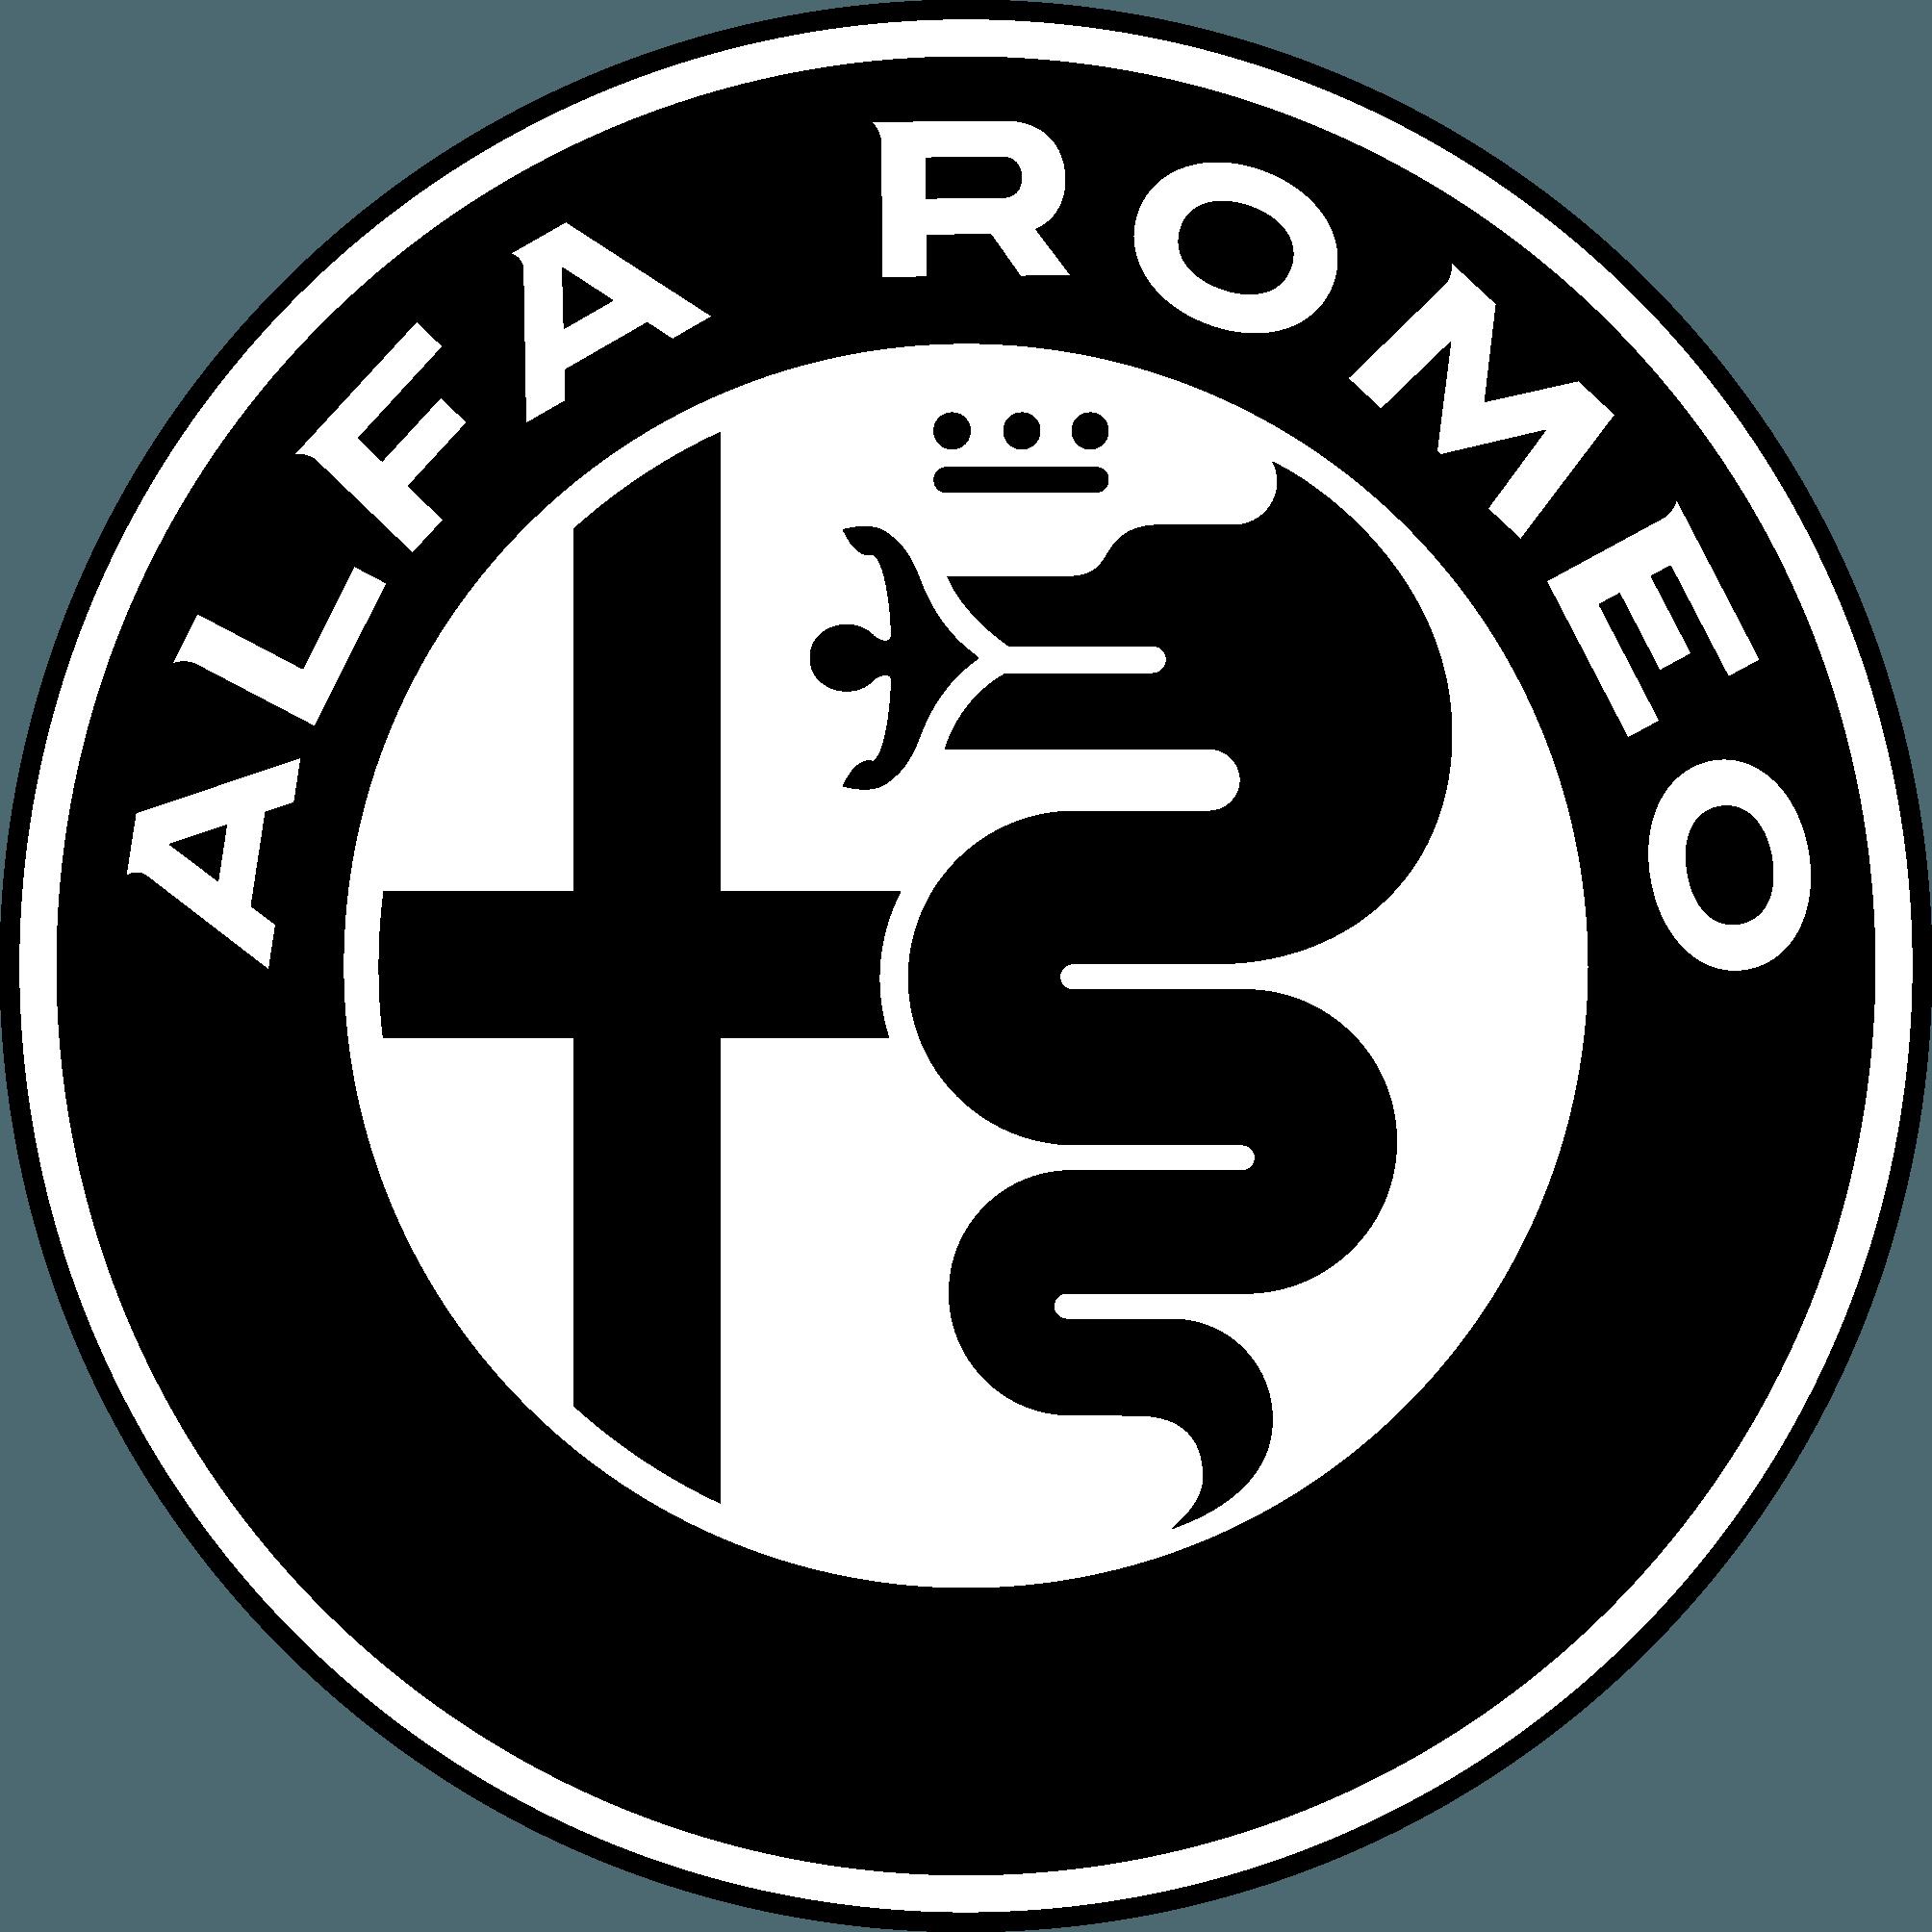 alfa romeo logo new 2015 pdf vector free download. Black Bedroom Furniture Sets. Home Design Ideas